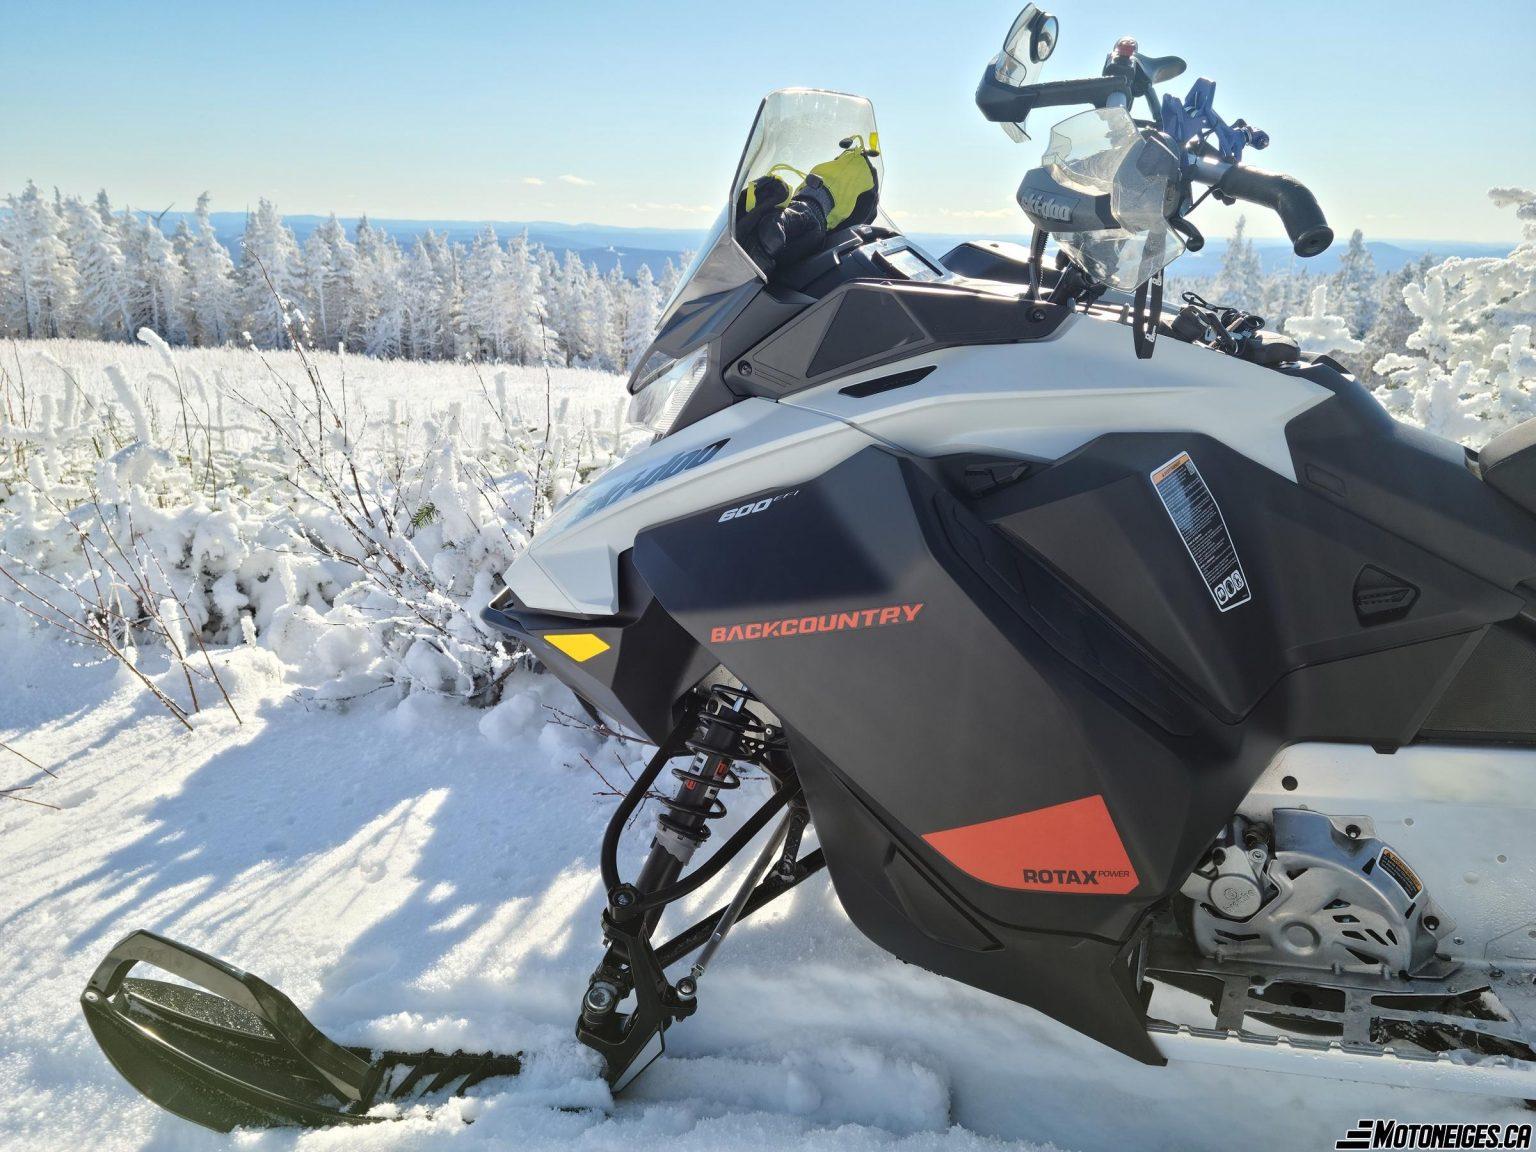 Backcountry Sport 2021 —Mon analyse pré-randonnée